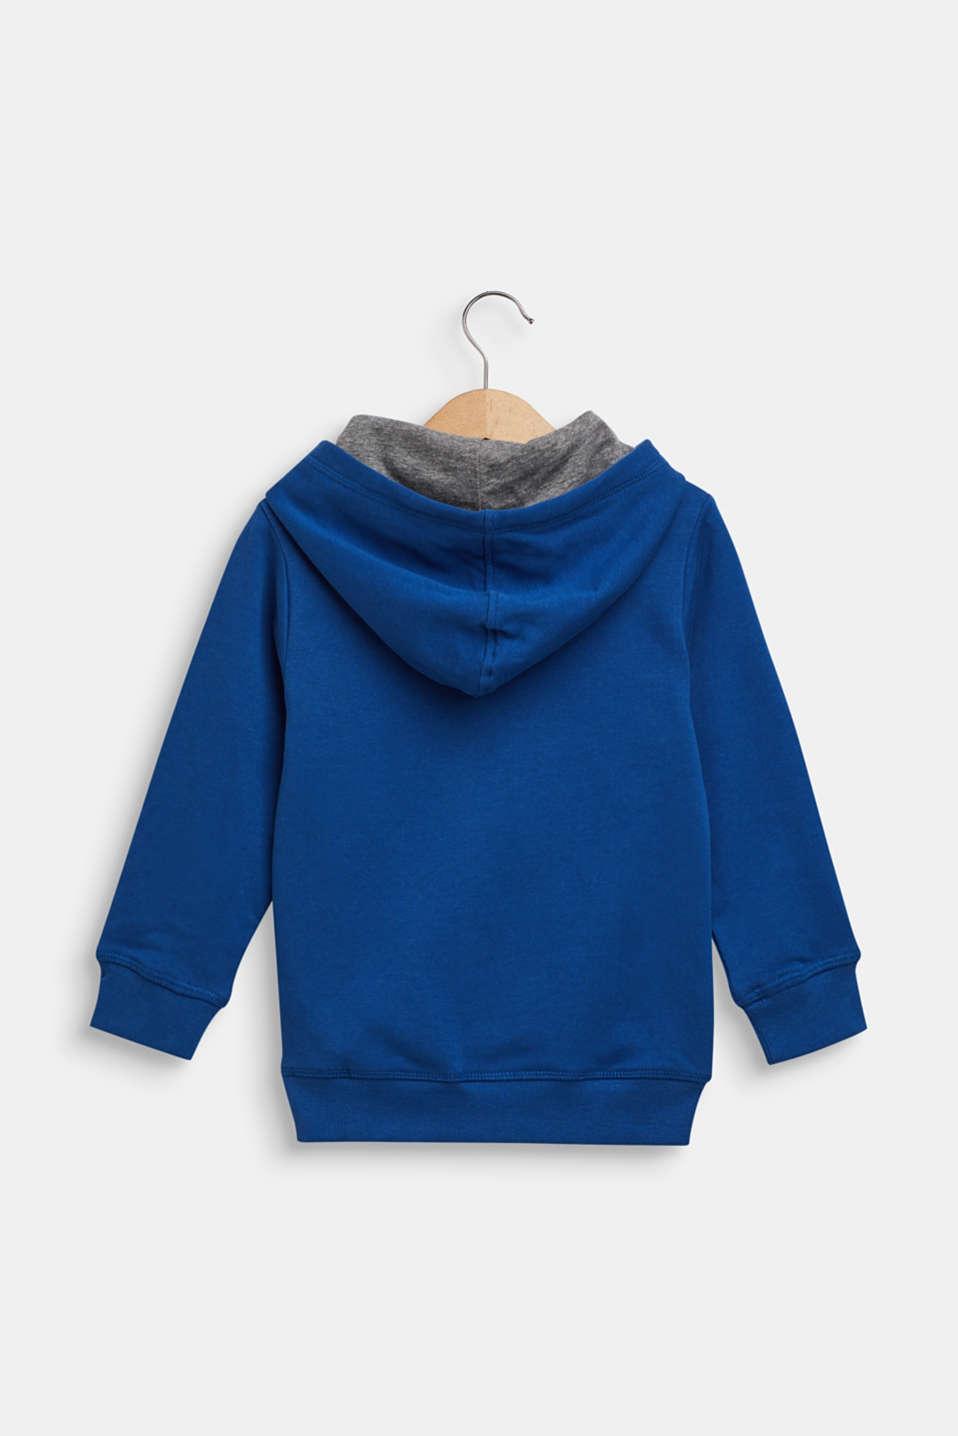 Hoodie with llama print, 100% cotton, indigo, detail image number 1